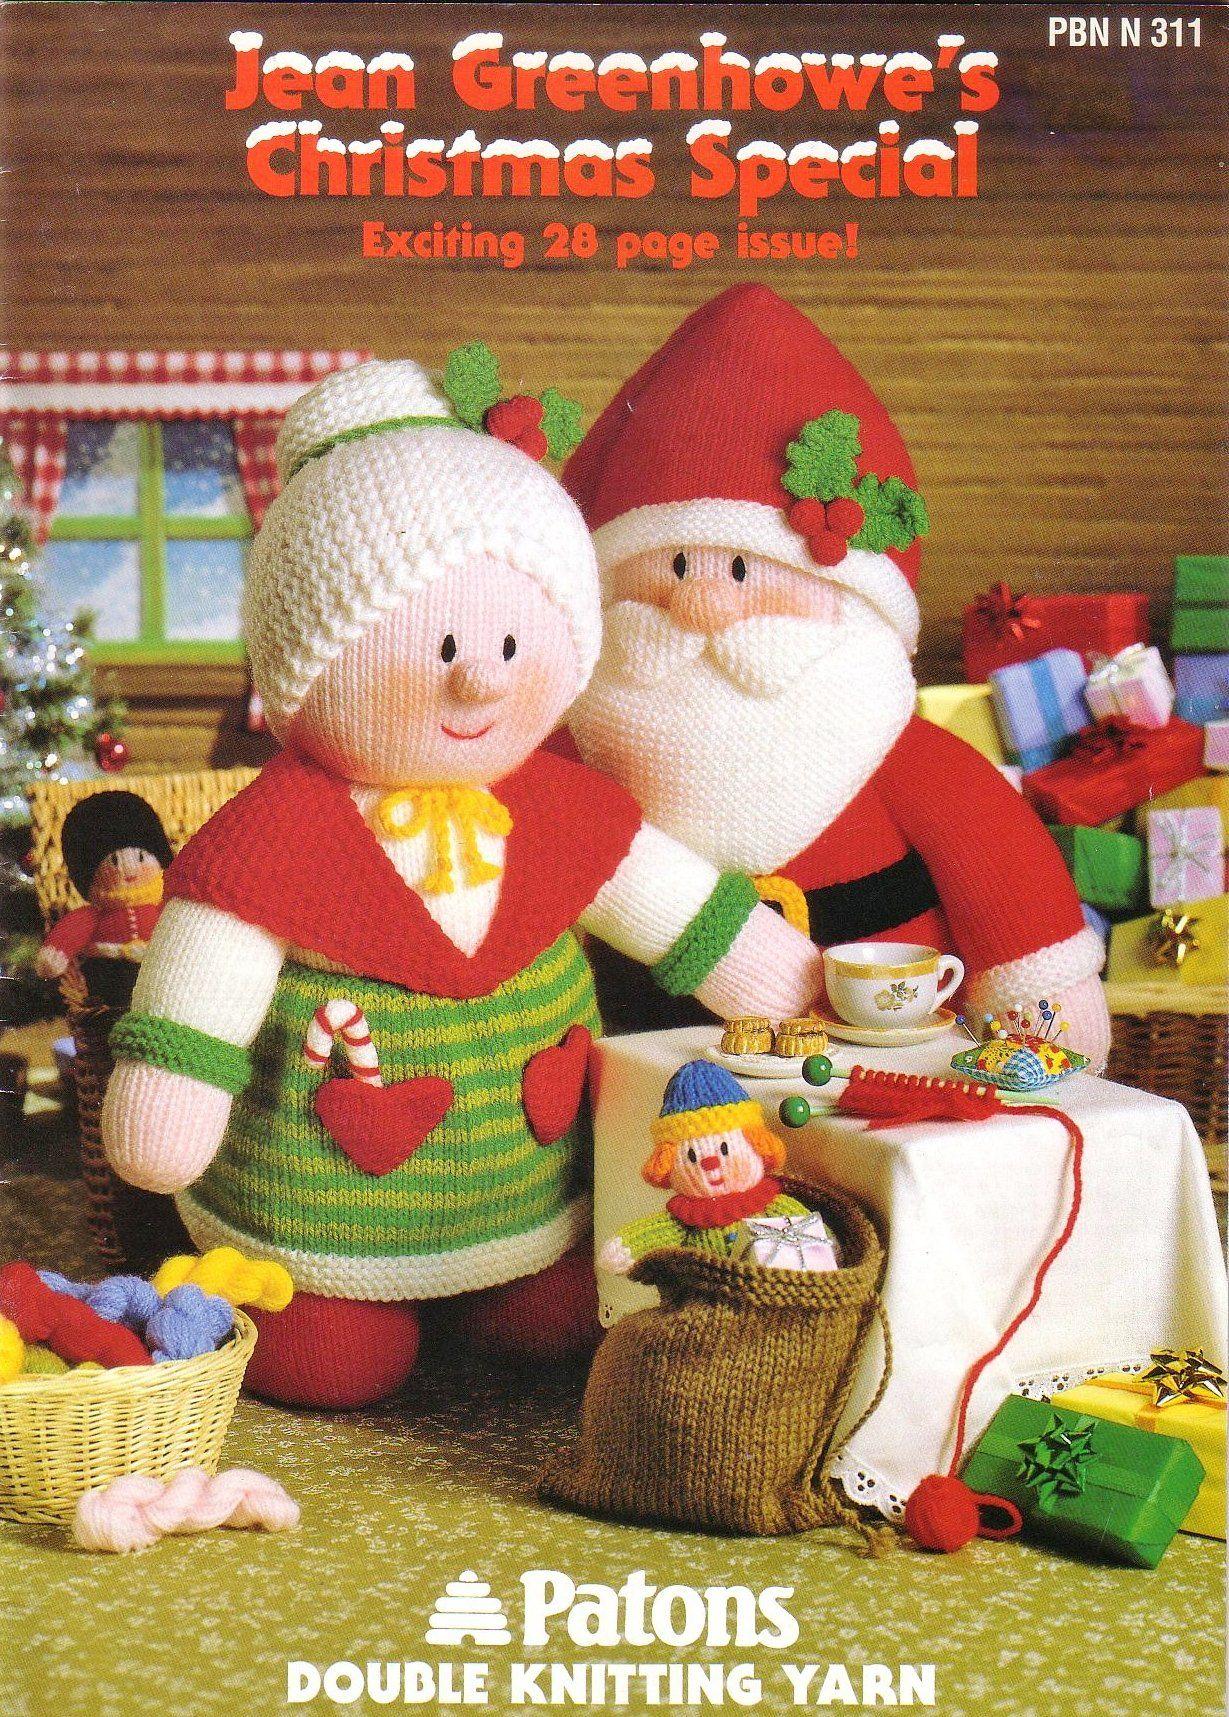 Jean Greenhowe's Christmas special: Amazon.co.uk: Jean ...